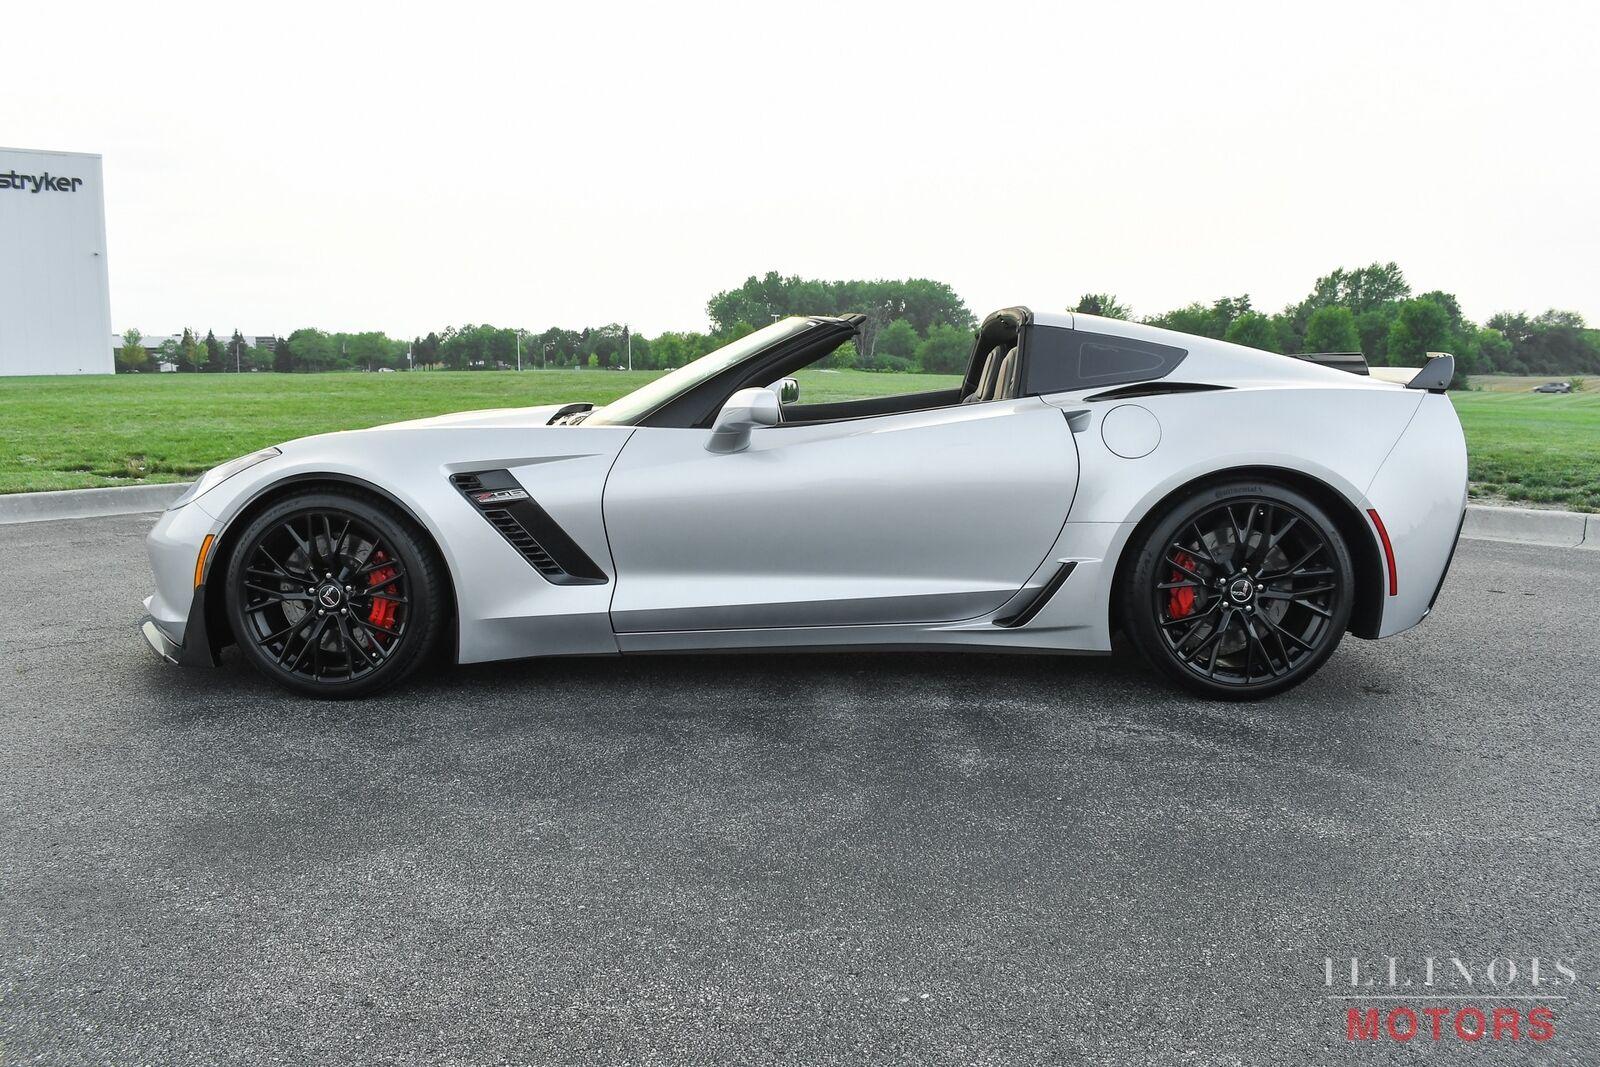 2015 Silver Chevrolet Corvette Z06  | C7 Corvette Photo 3